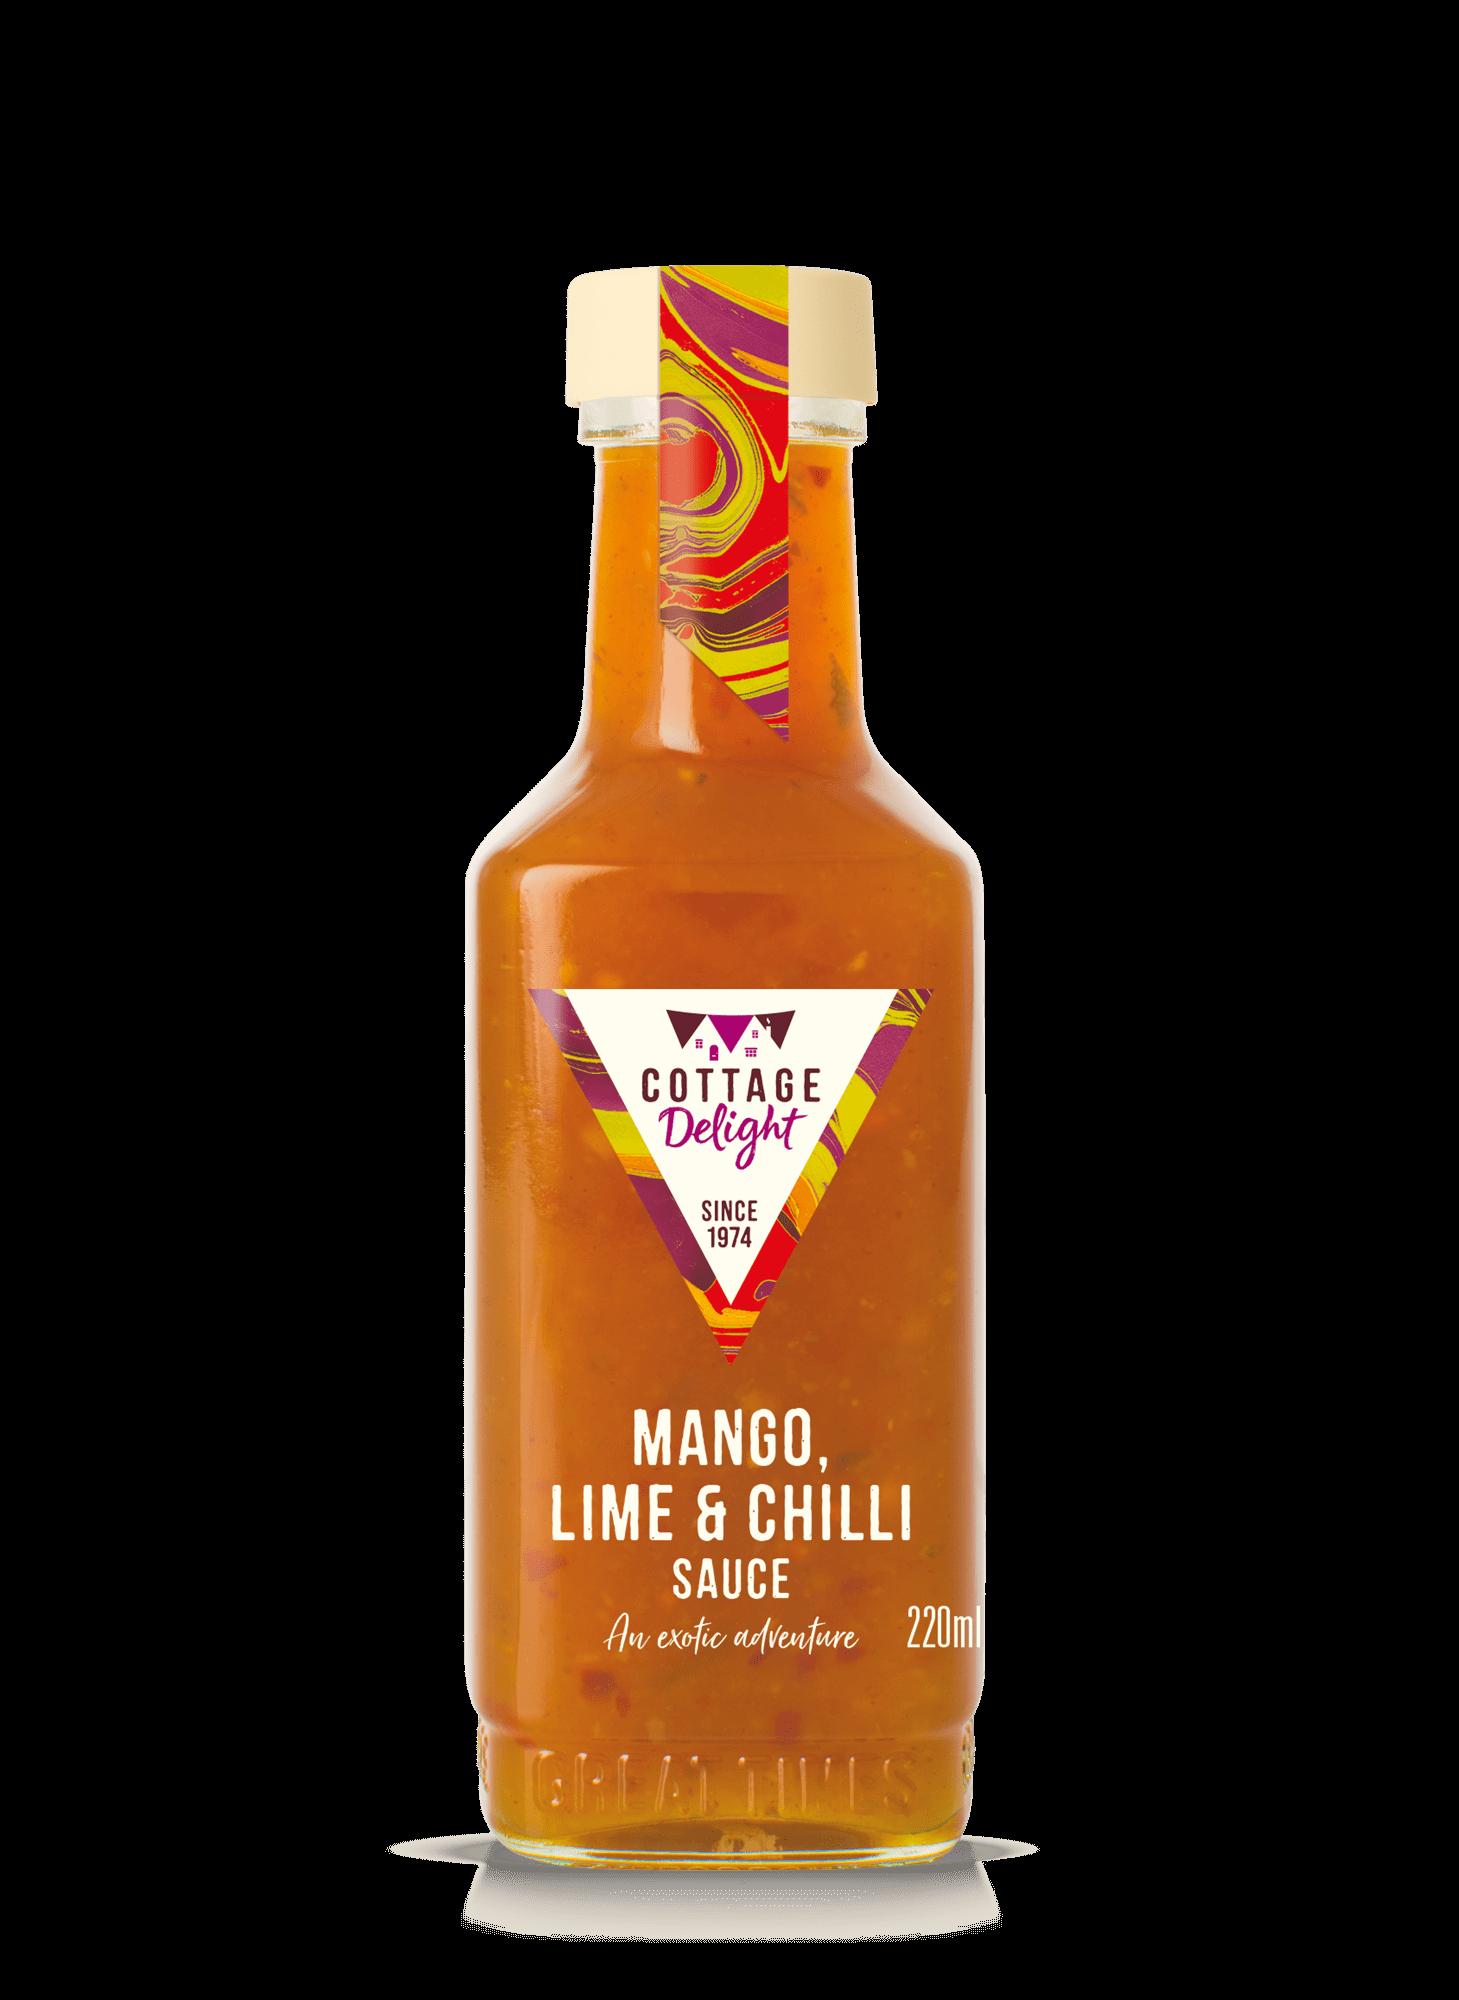 Mango Lime & Chilli Sauce